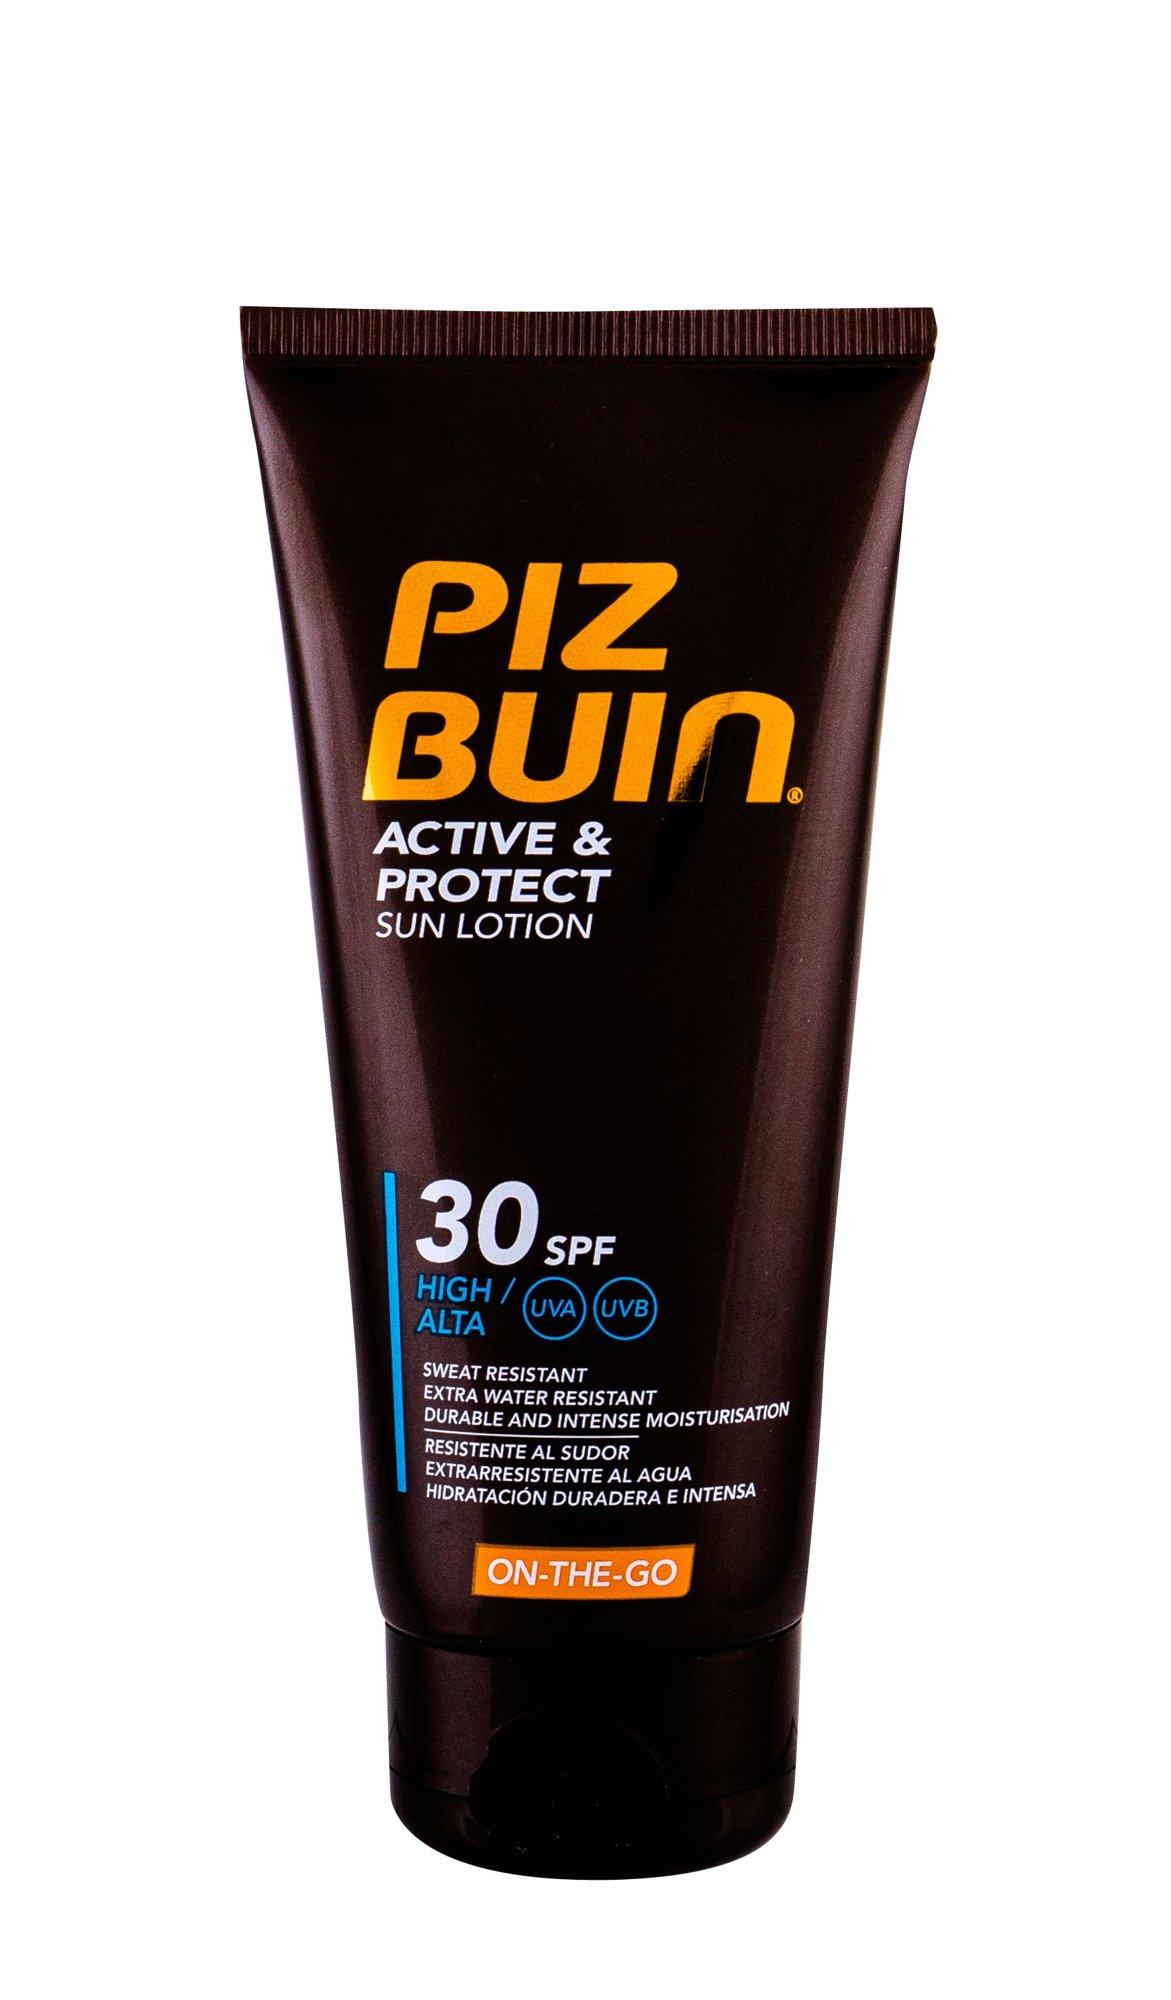 PIZ BUIN Active & Protect Sun Body Lotion 100ml